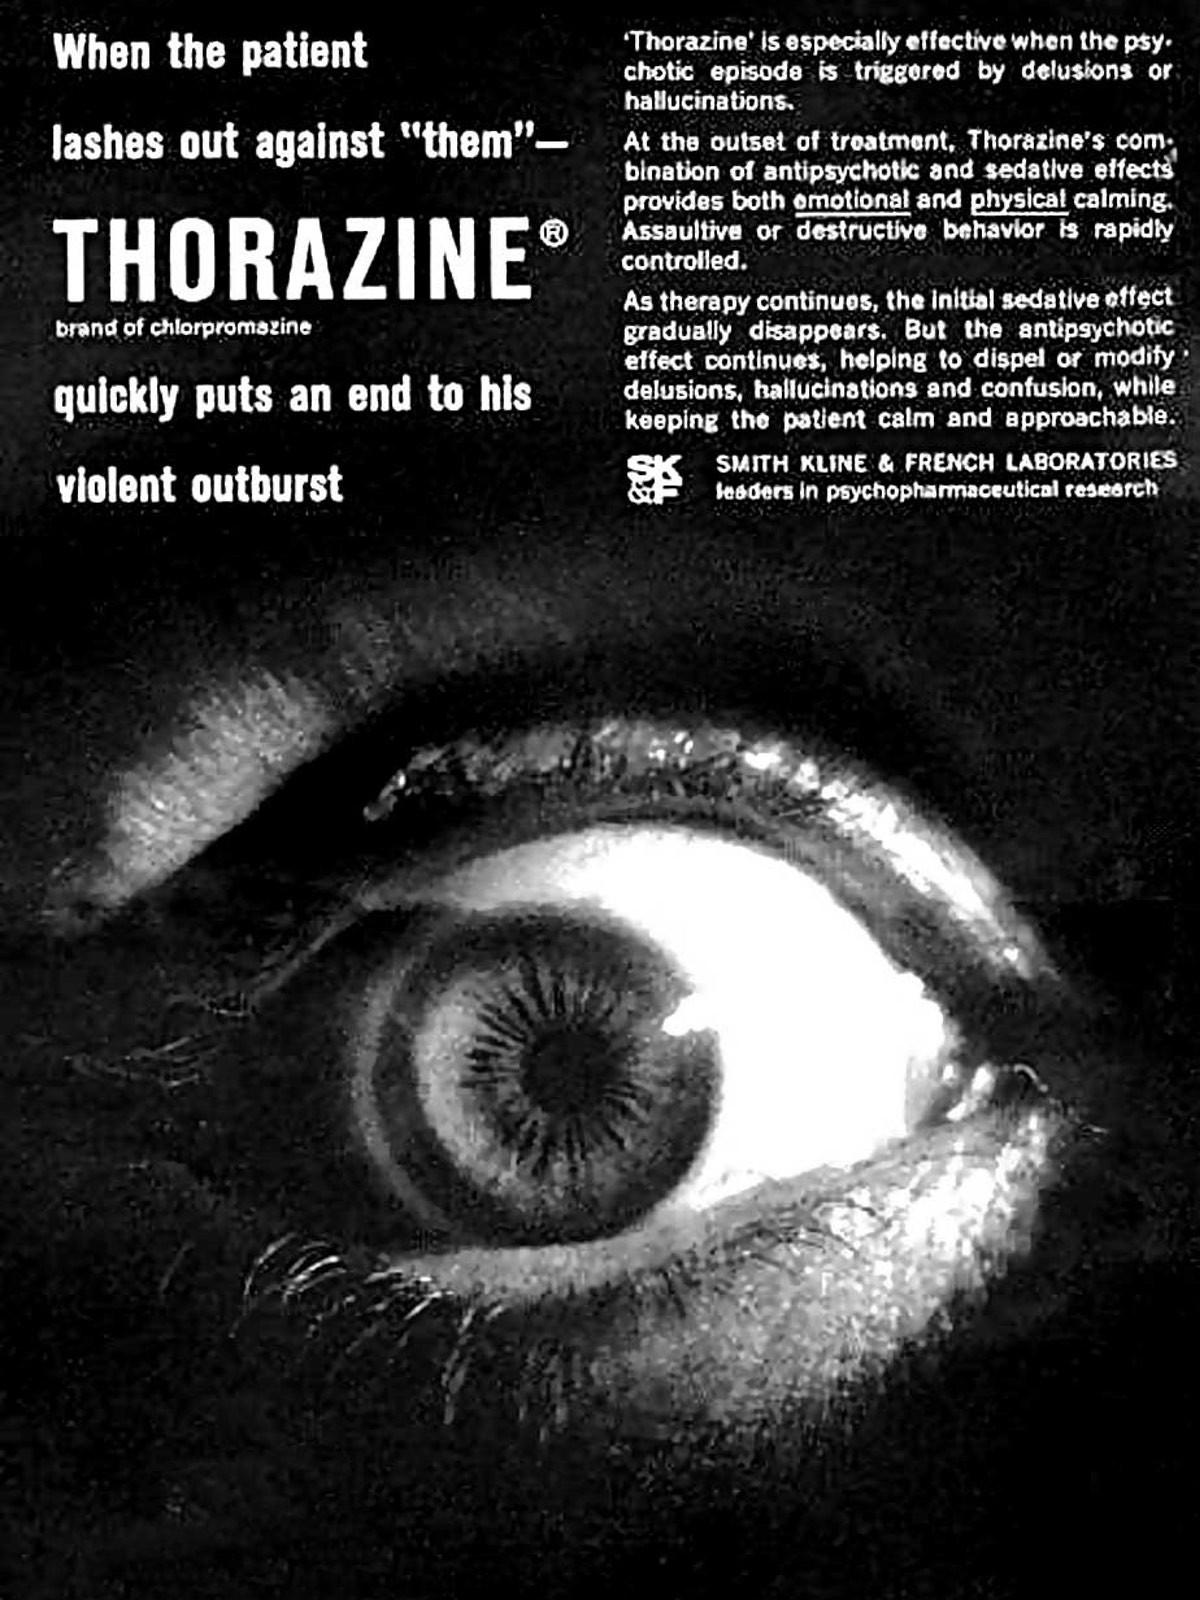 thorazine